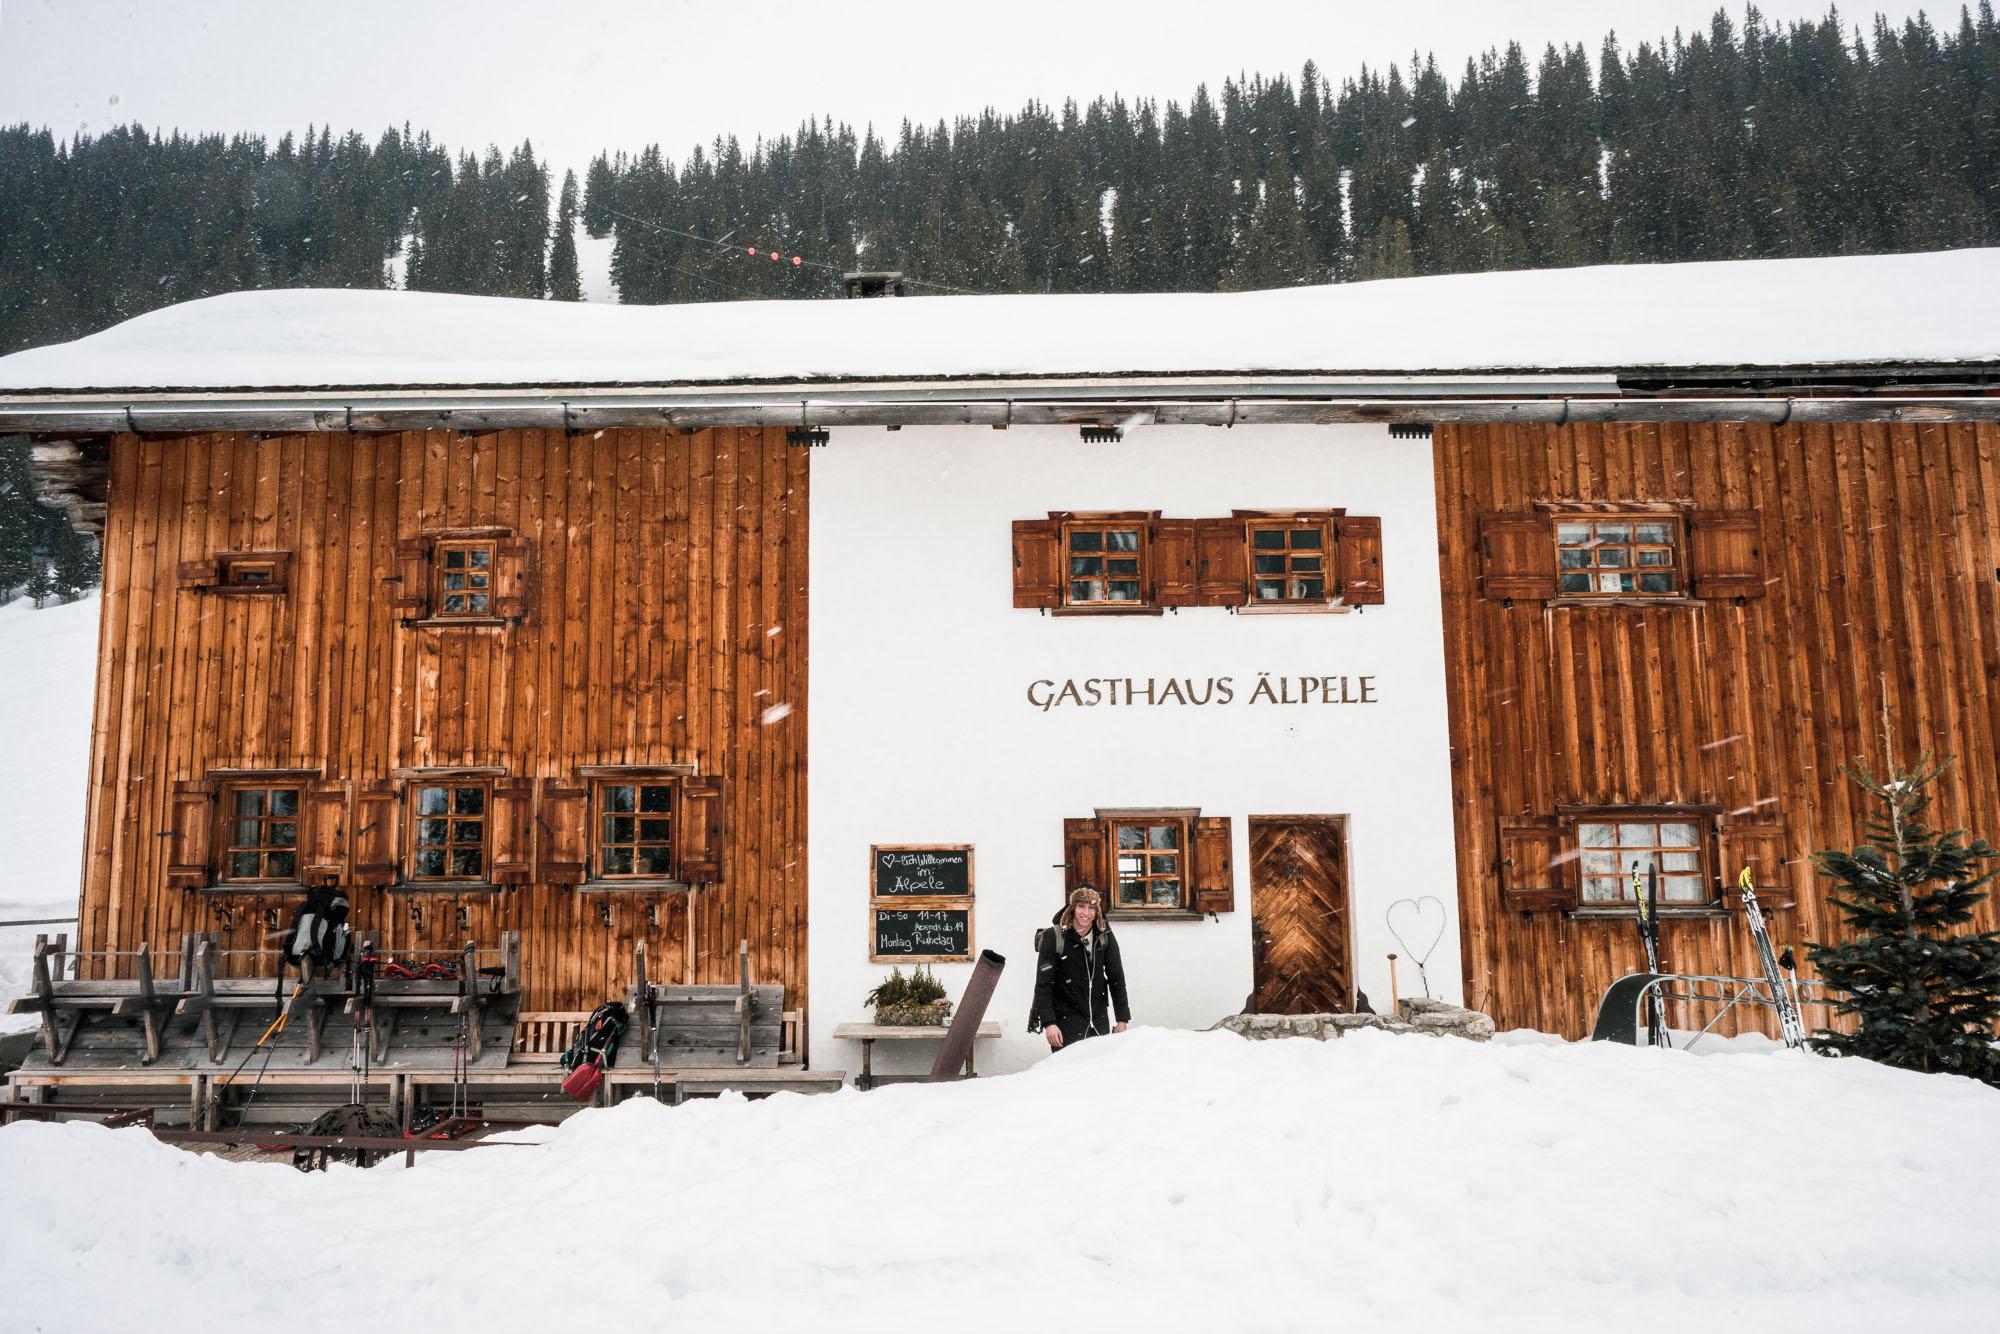 Cute Austrian Hotels and restaurants in Lech, Austria